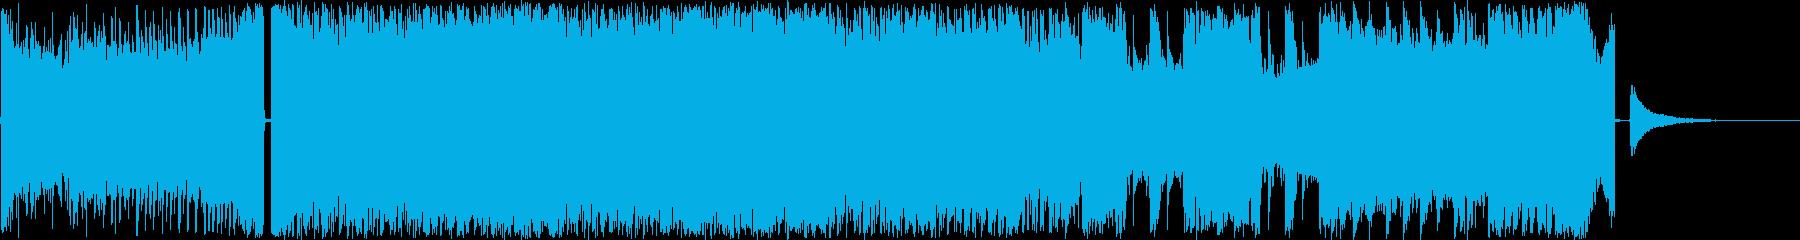 CM、疾走、ドライブ感ダンスロックの再生済みの波形